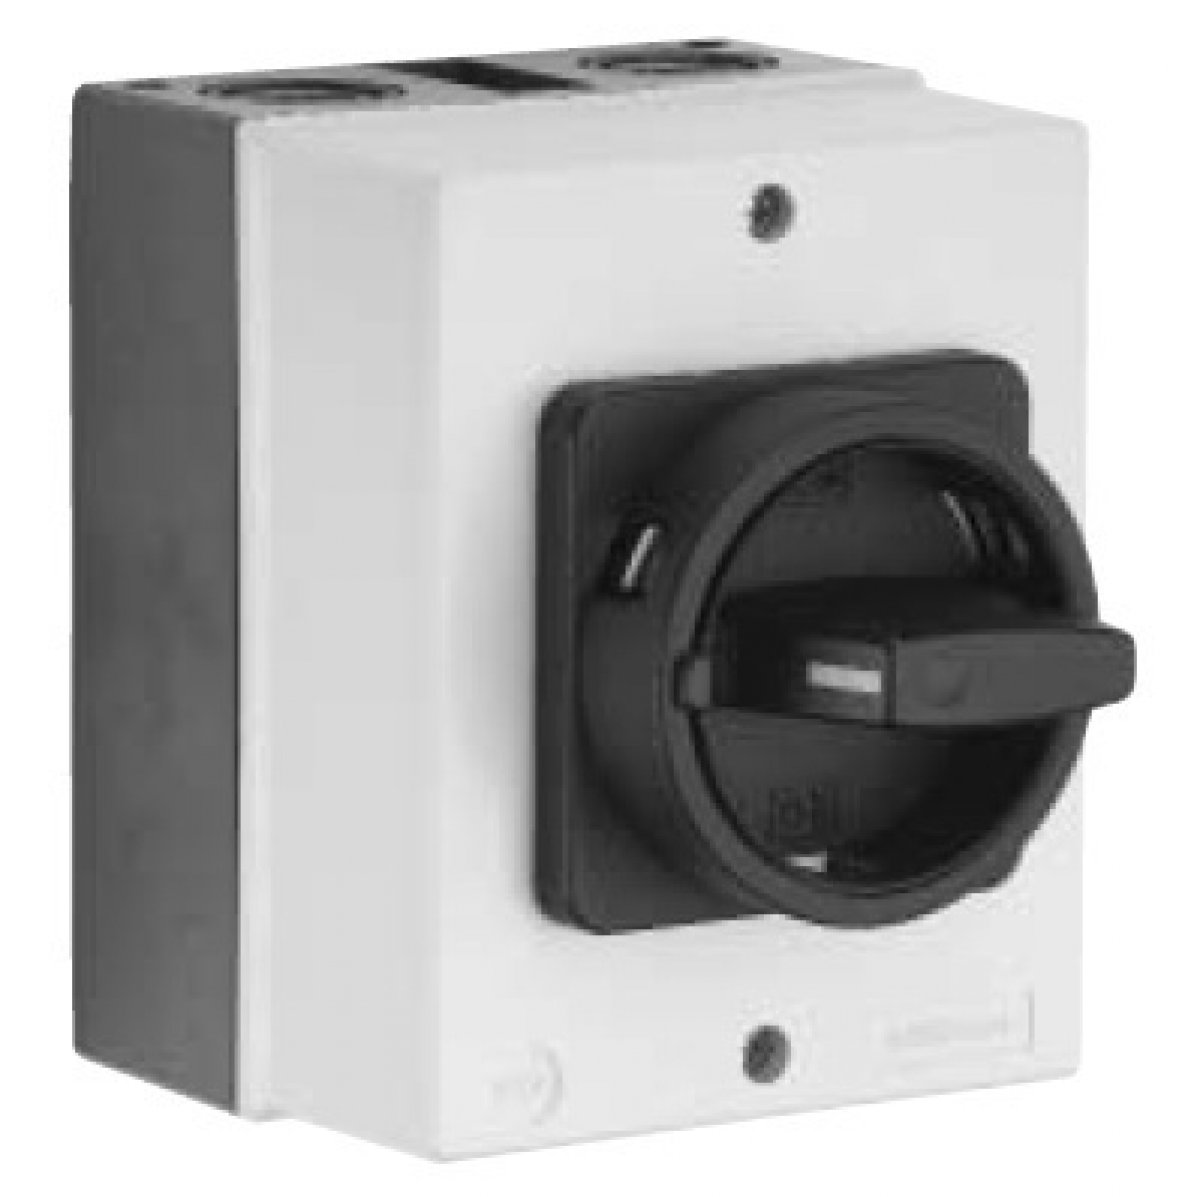 Rookgasventilator Serviceafsluiter 2-polig - Kutzner & Weber